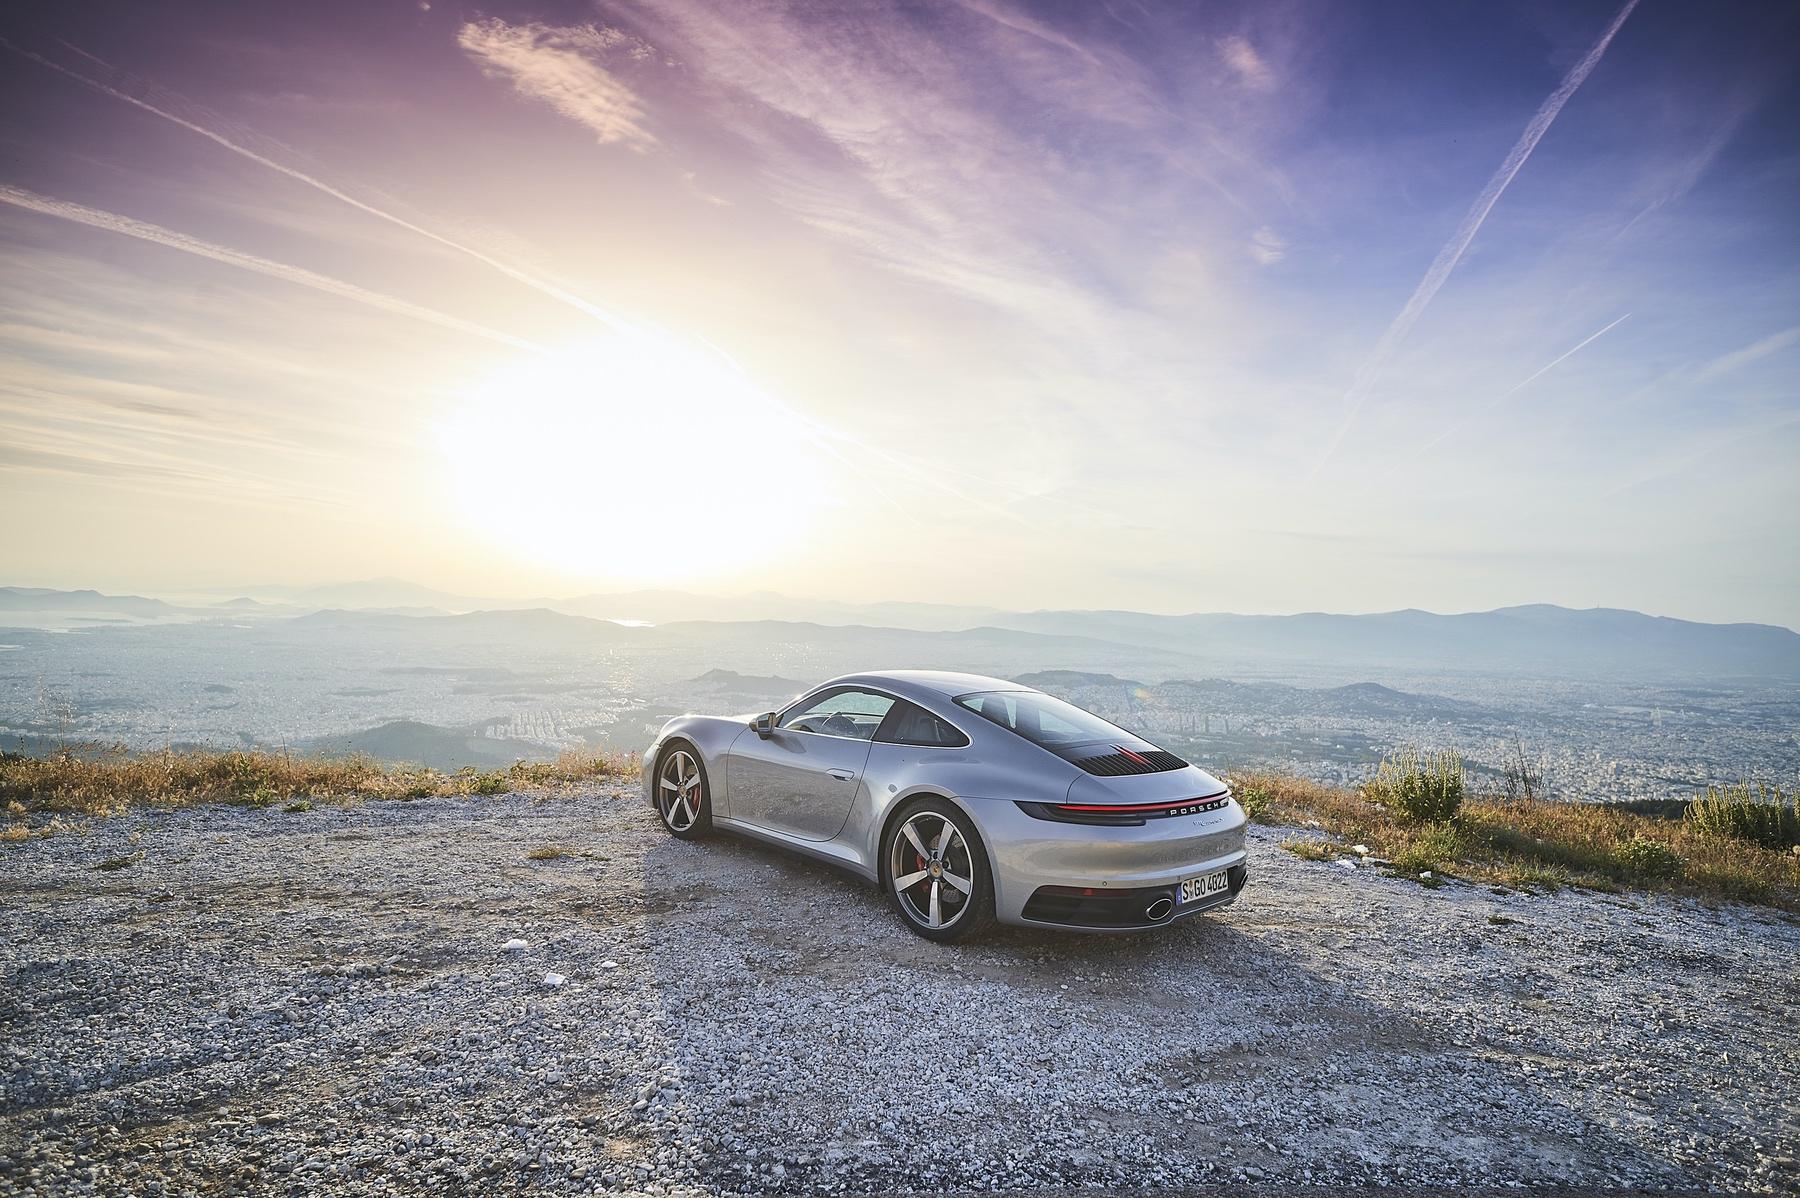 Test_Drive_Porsche_911_Athens_0052